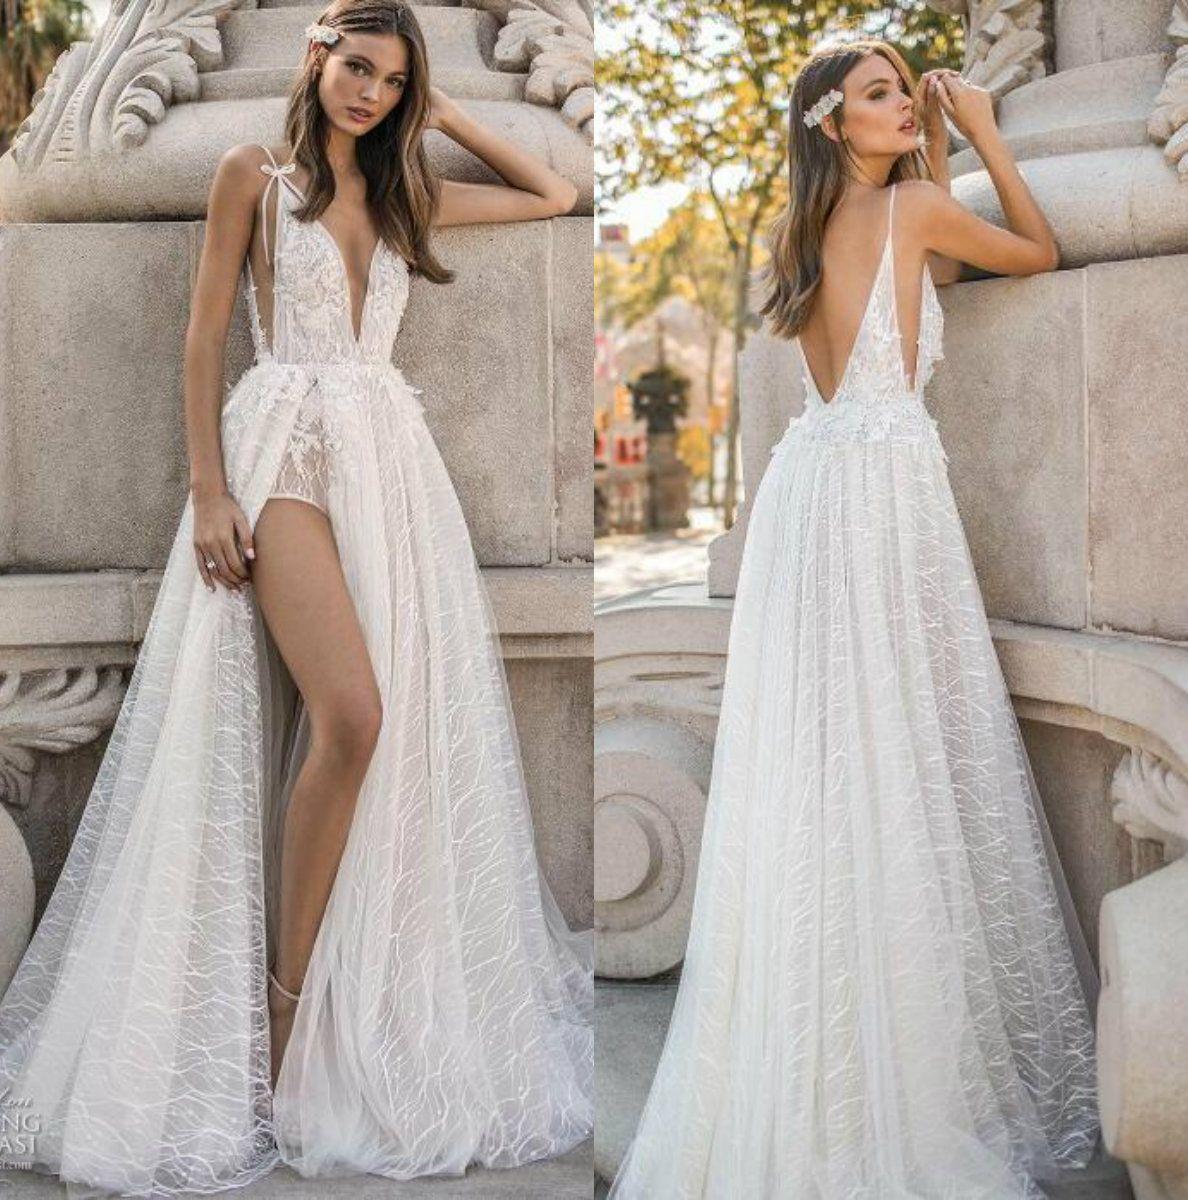 Muse By Berta 2019 Wedding Dresses V Neck Backless Crystal